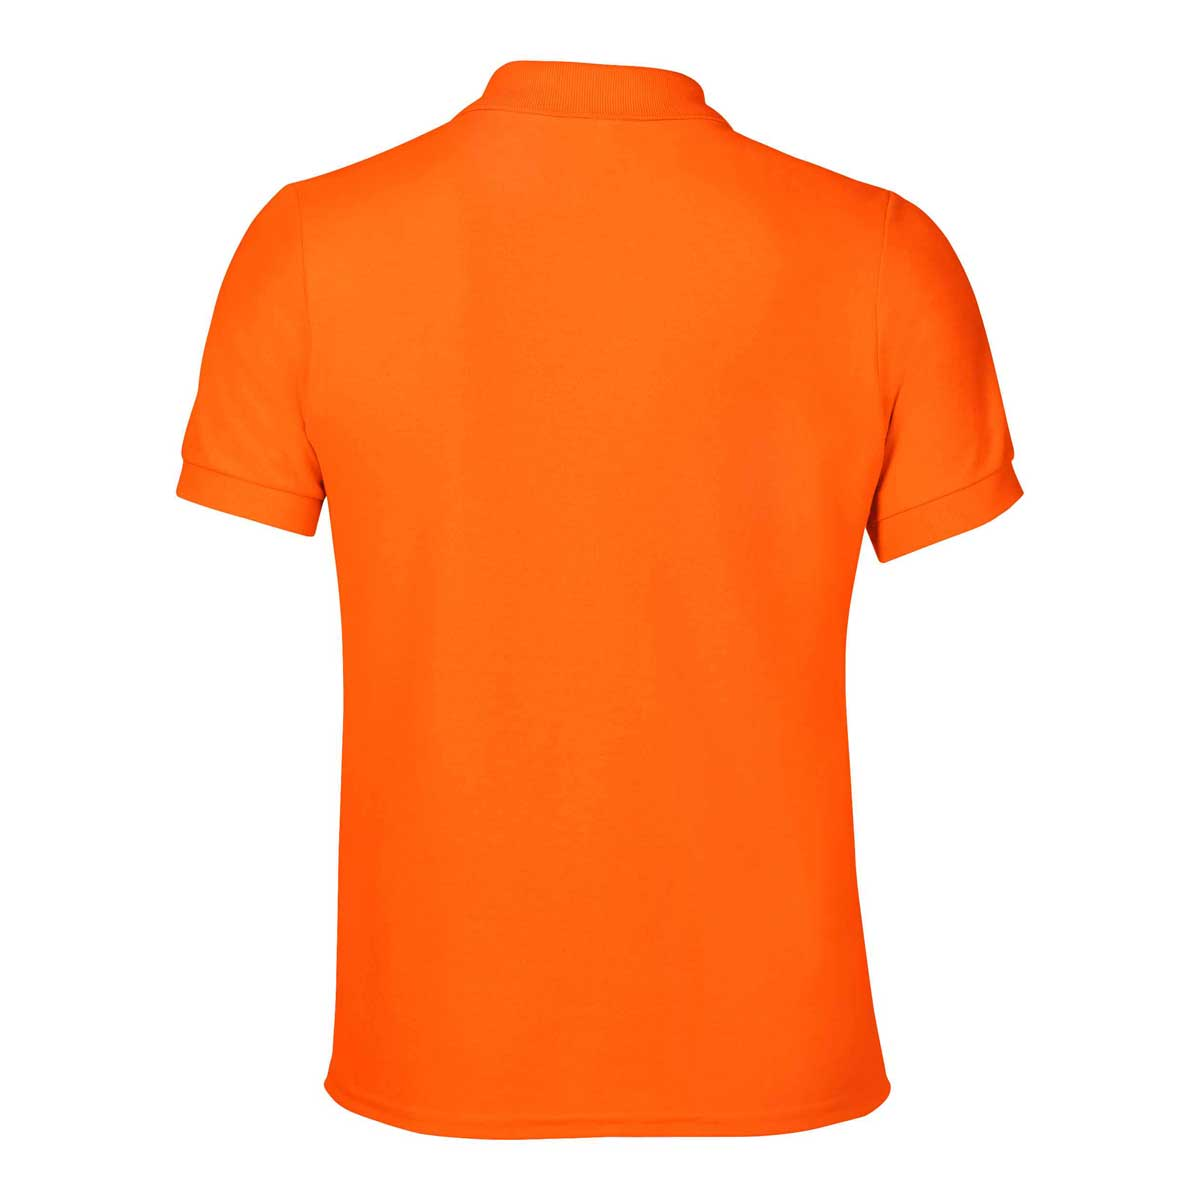 05_ba301_orange--0-0--a11126c5-960a-46d9-9639-f6567e535d39